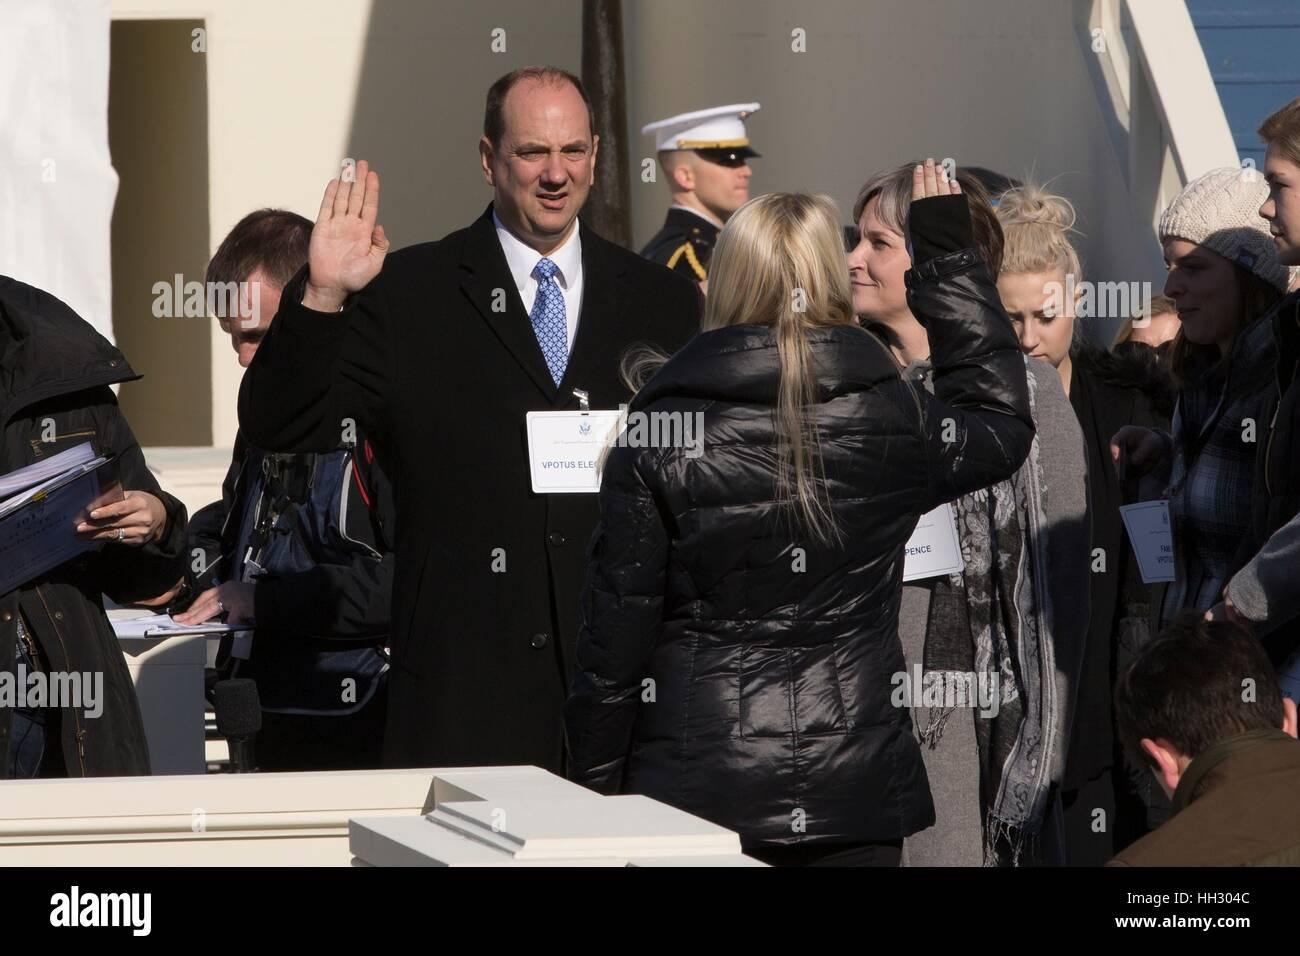 Washington, DC, USA. 15. Januar 2017. Stand-in für Vice President wählen Mike Pence wird während Stockbild